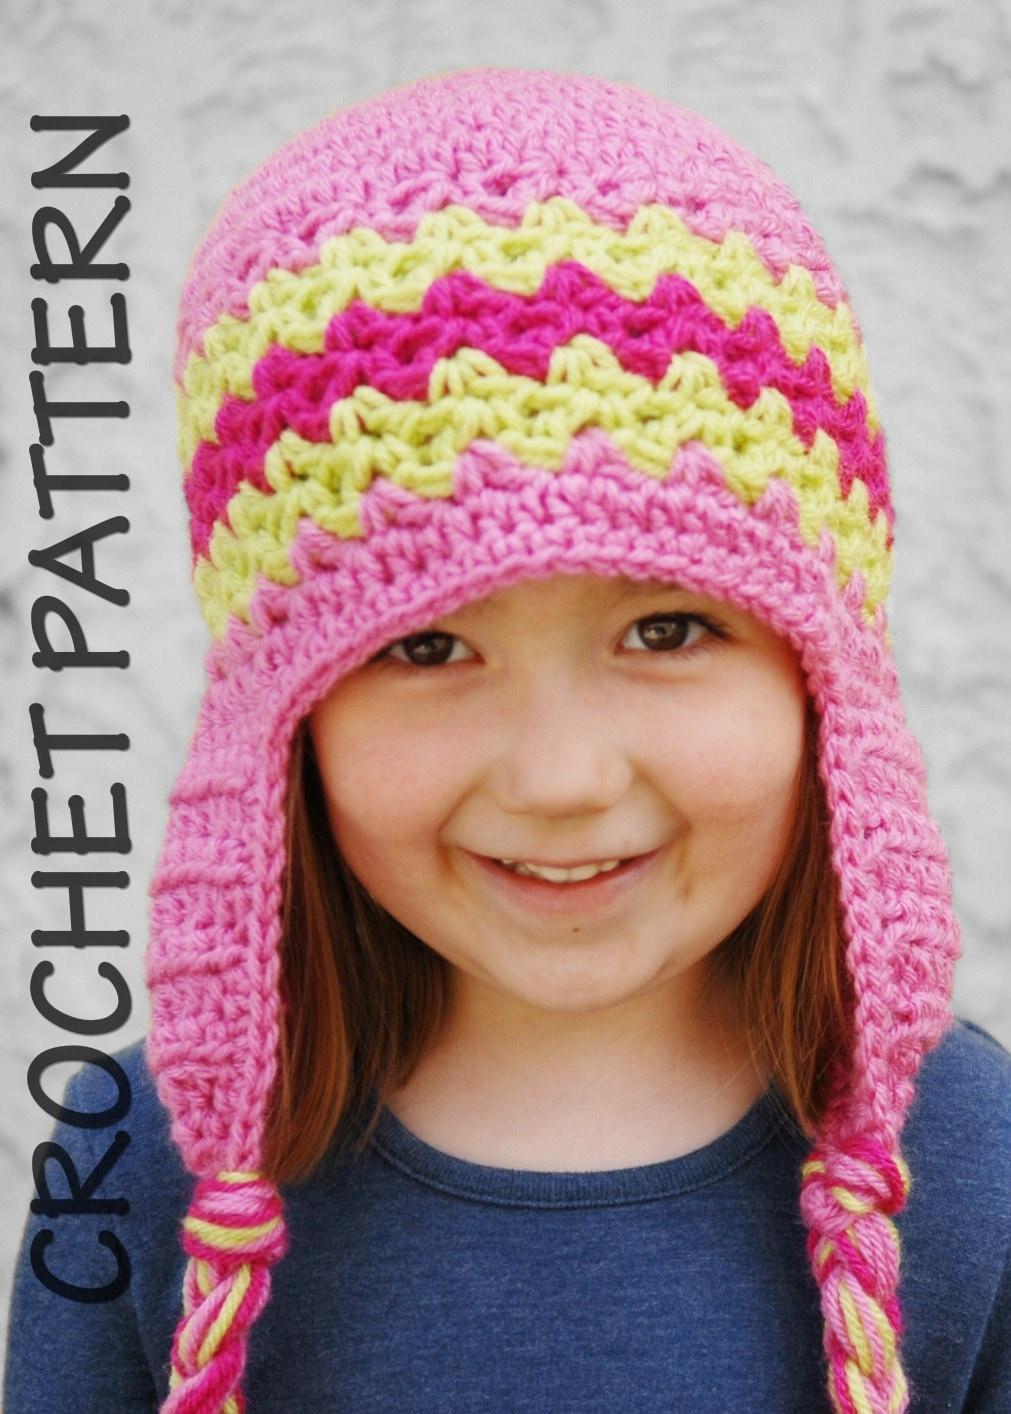 Childrens Hats Patterns 171 Free Patterns